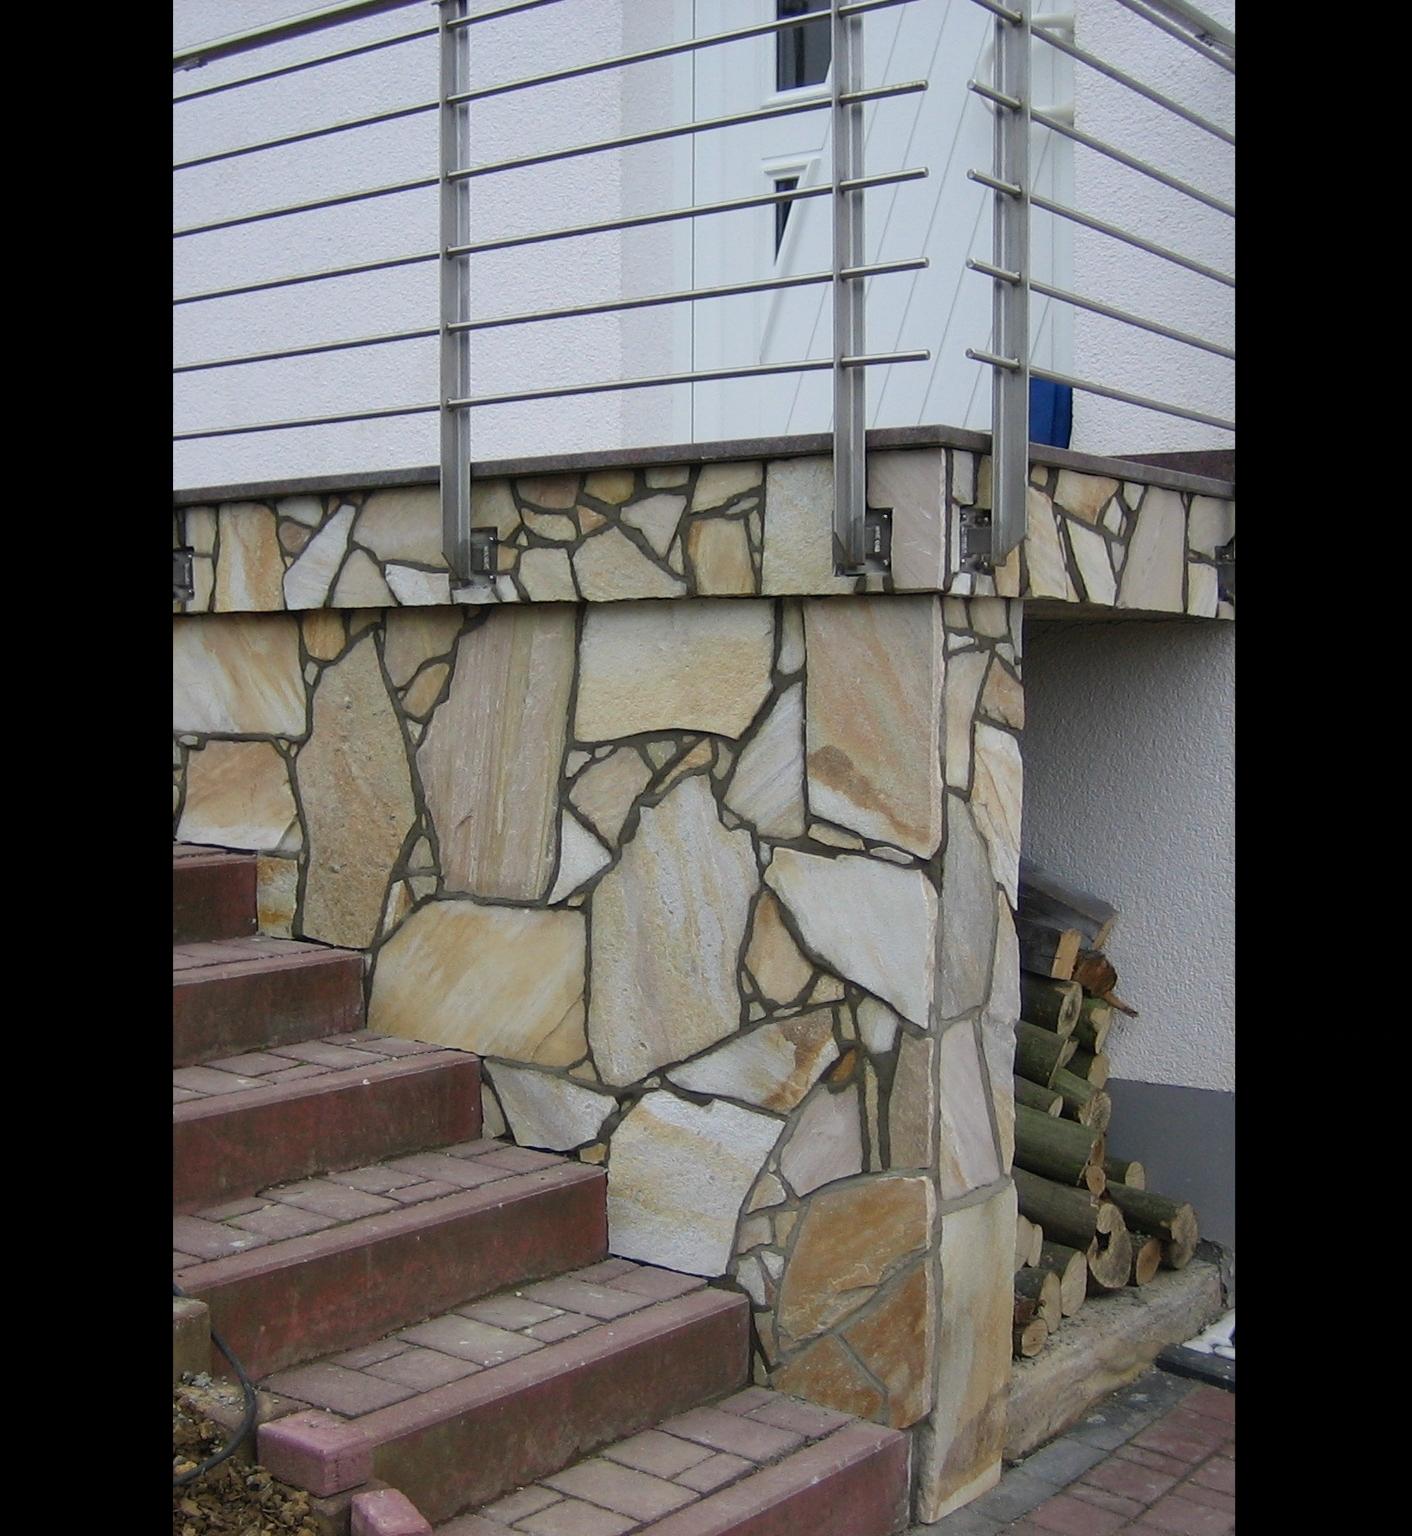 Treppenaufgang mit Polygonalplatten